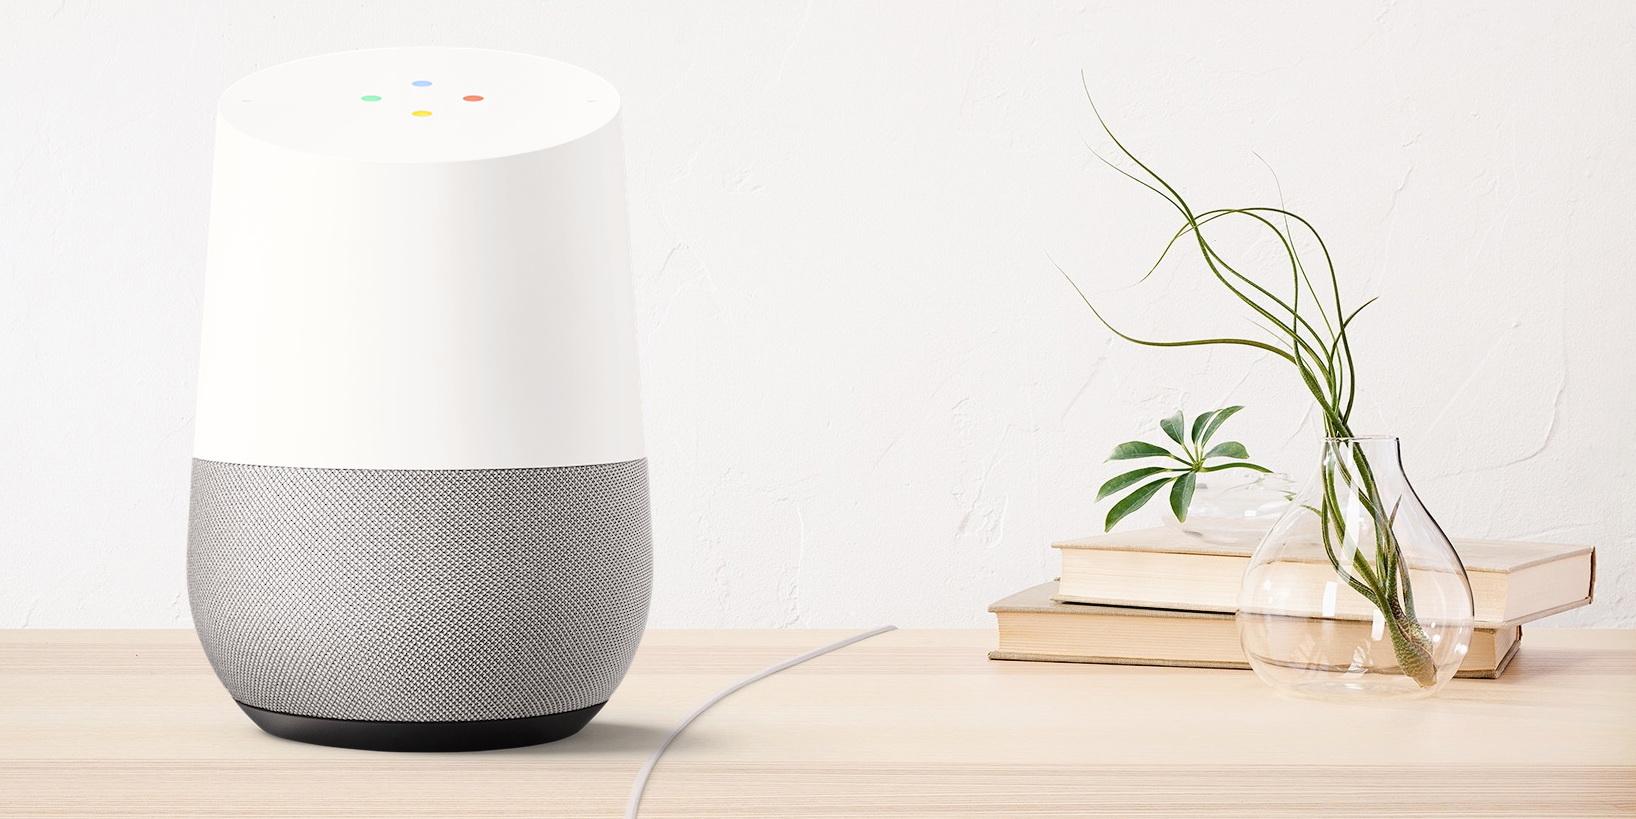 google home ab dem 8 august f r 150 euro in deutschland. Black Bedroom Furniture Sets. Home Design Ideas